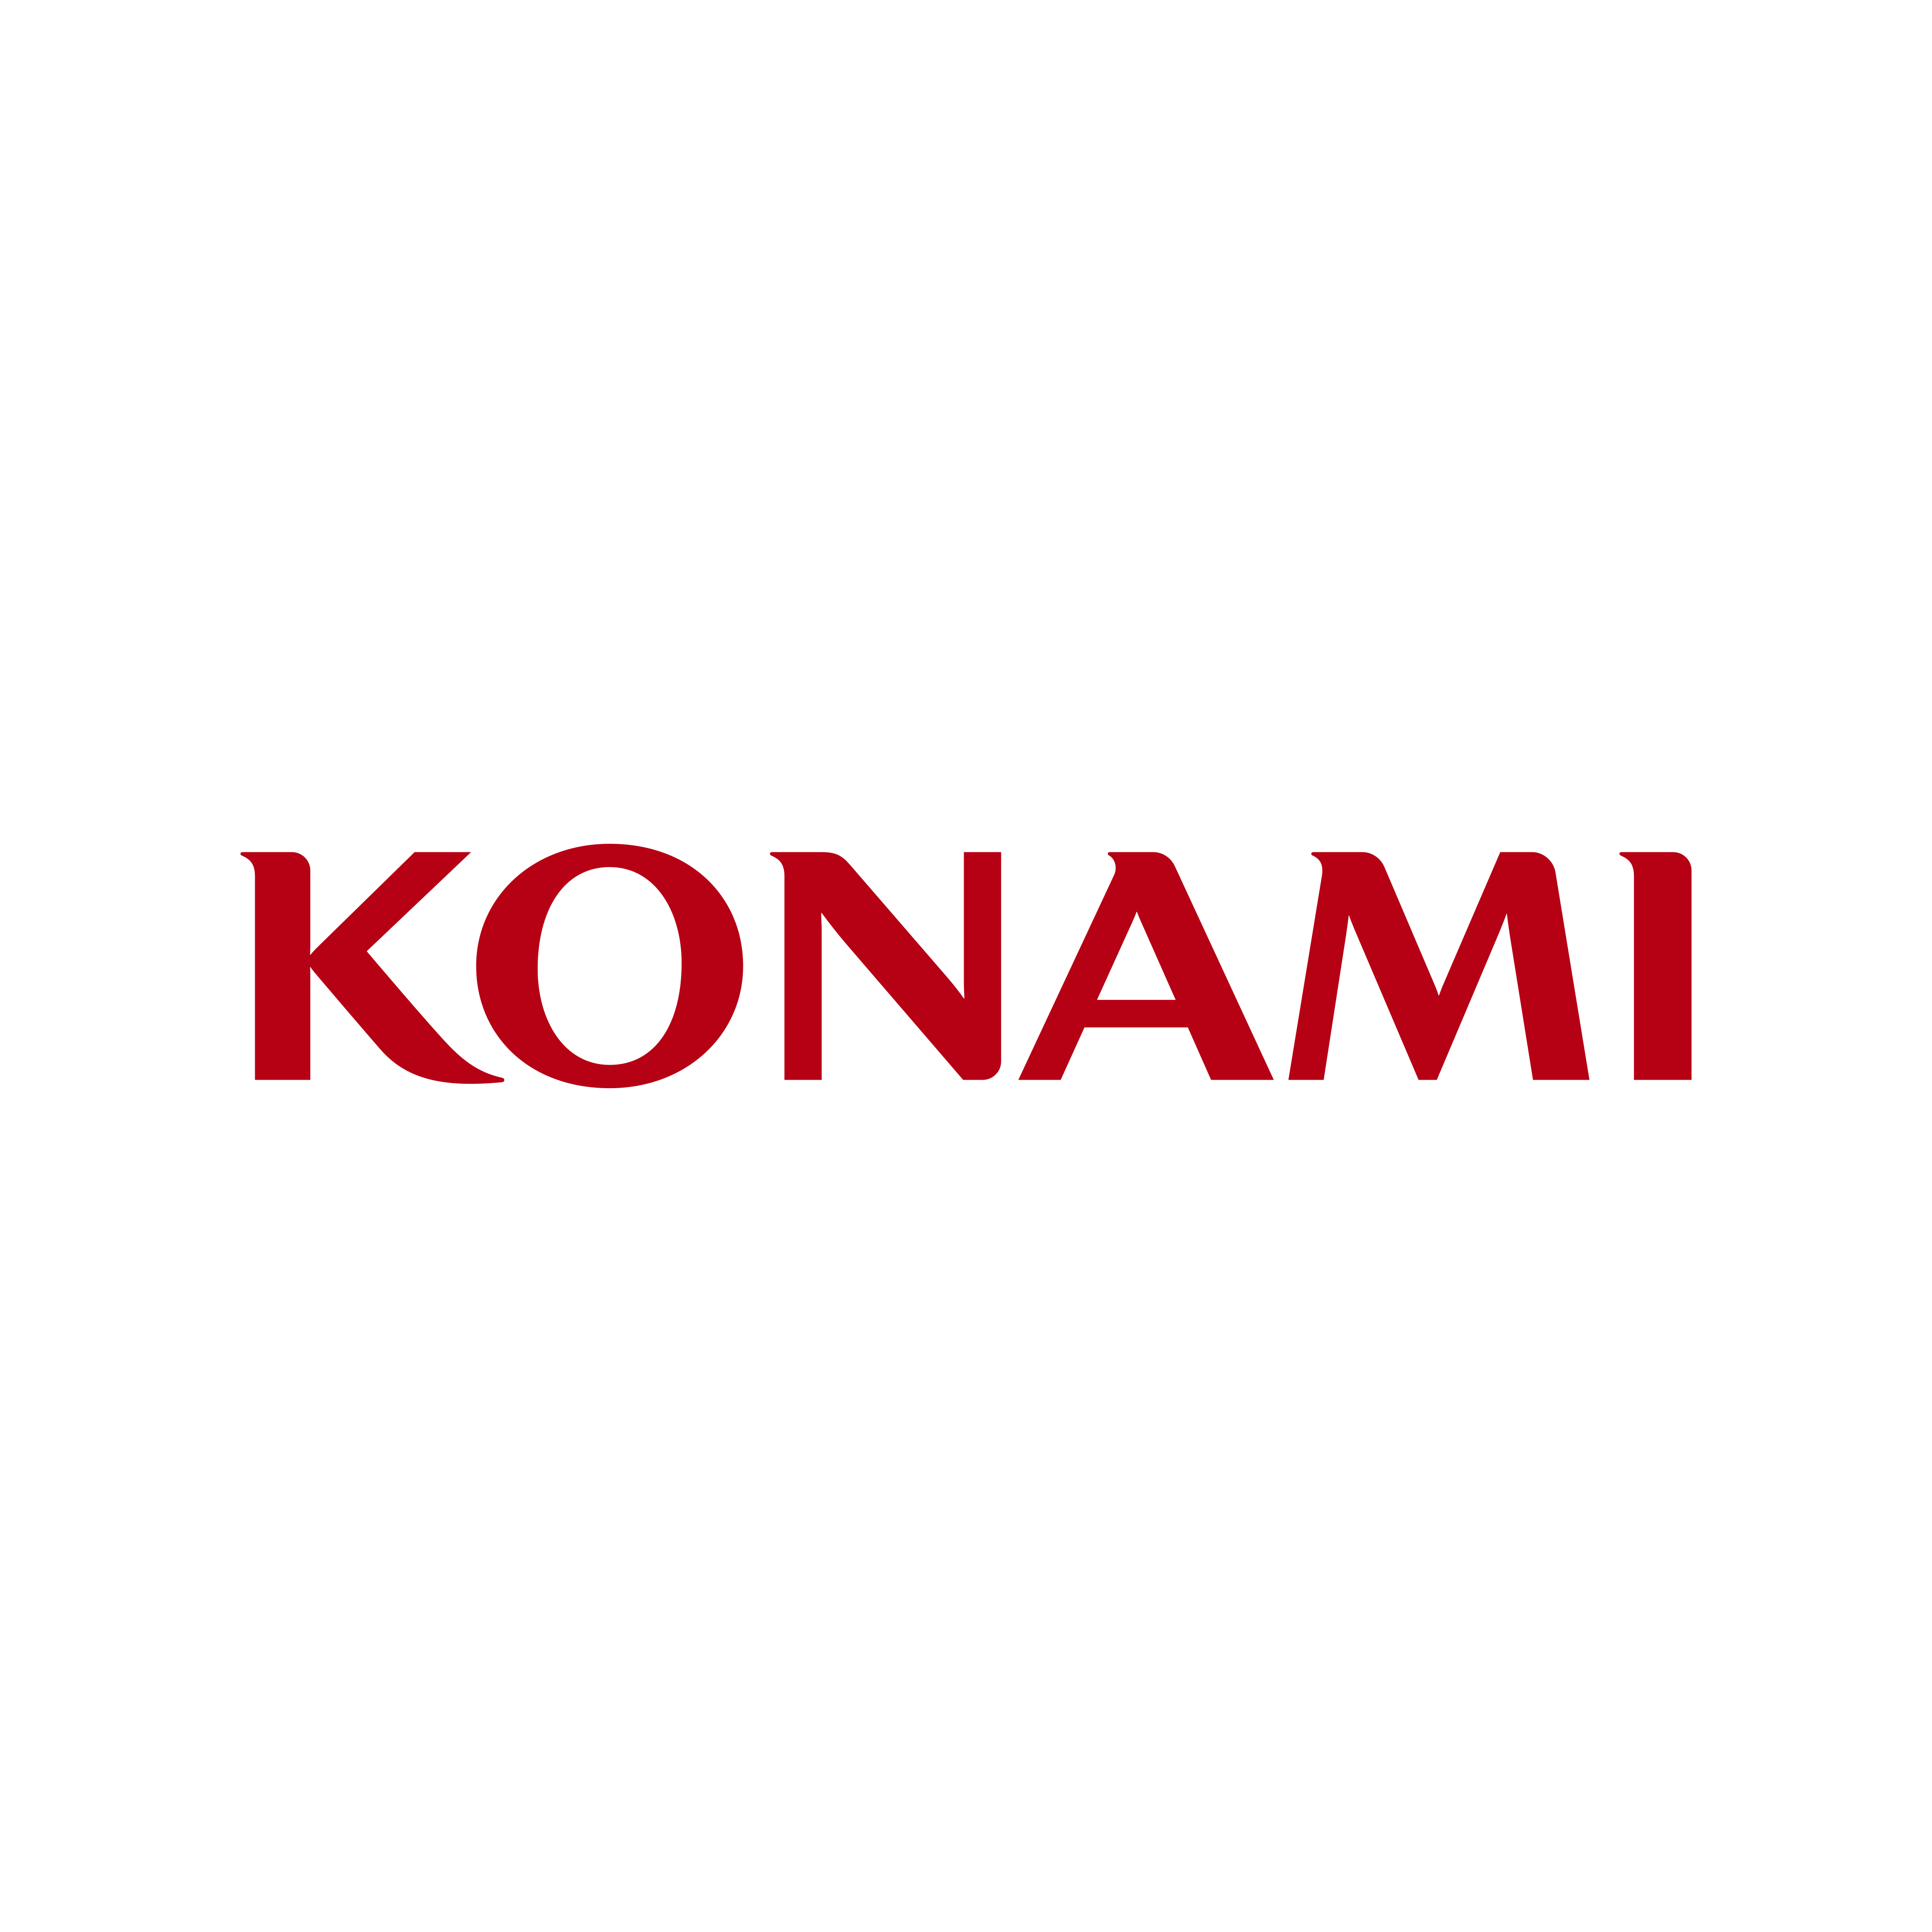 konami logo 0 - Konami Logo